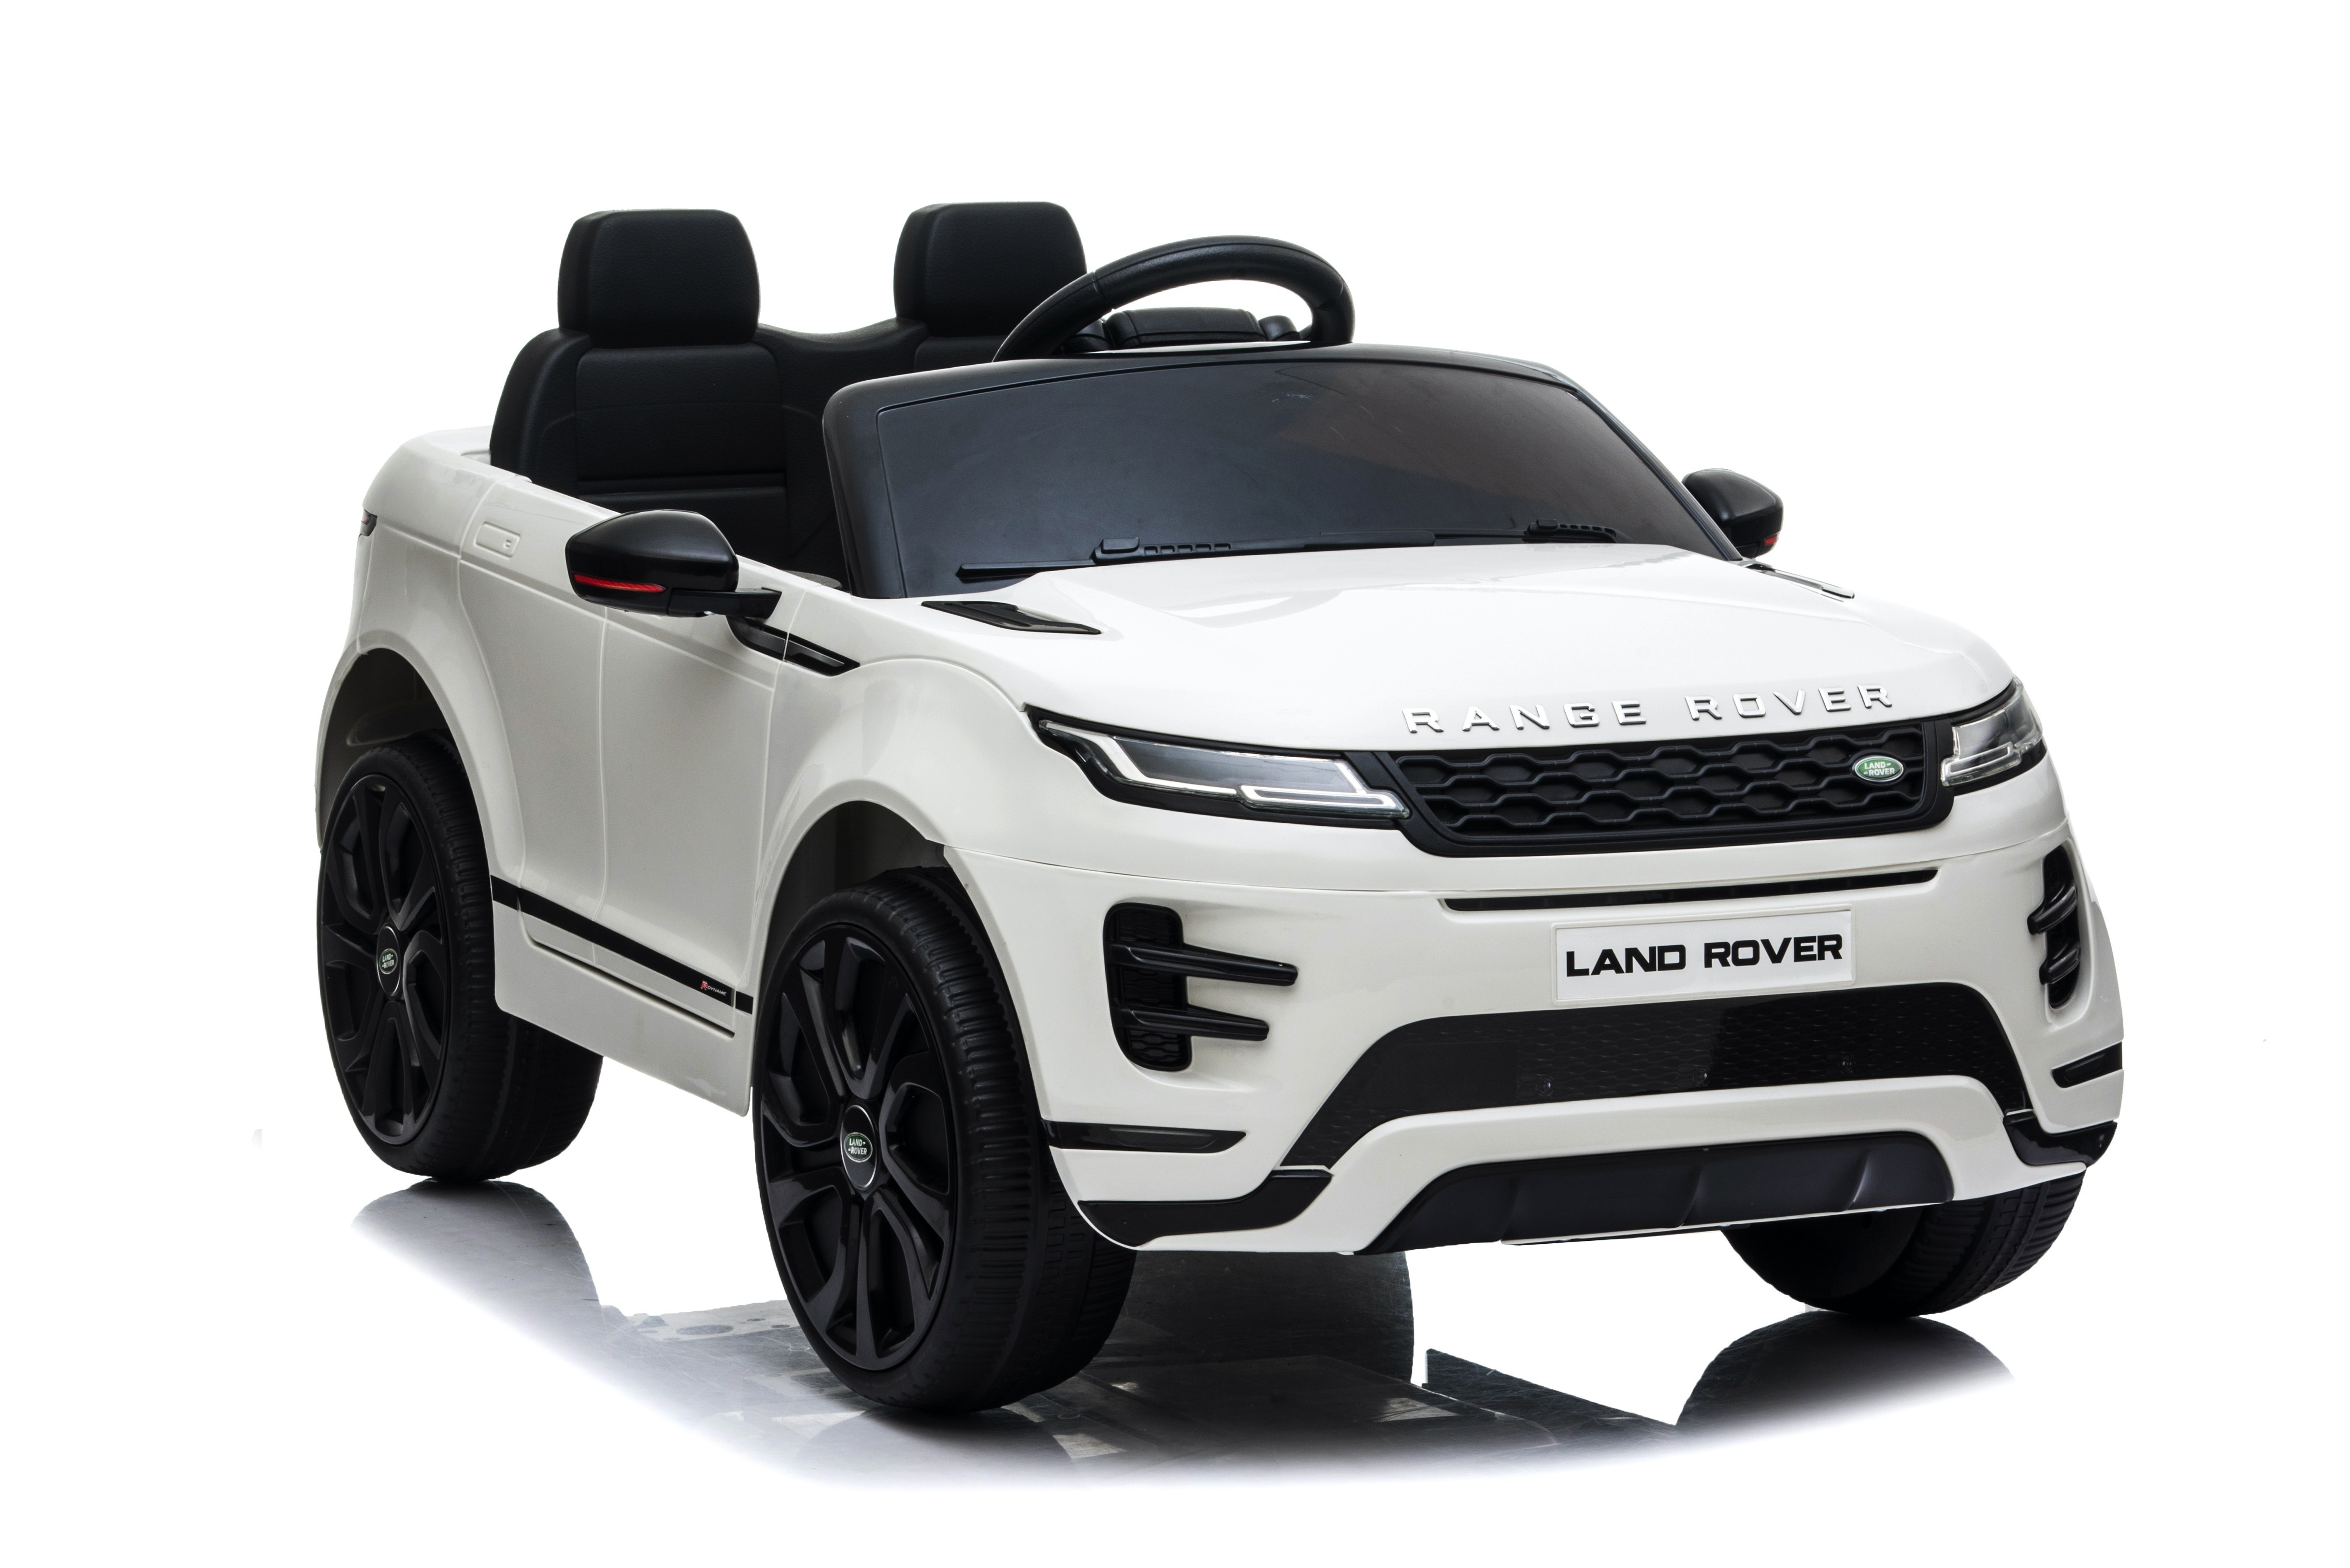 Macchina Elettrica per Bambini 12V Land Rover Evoque Bianca